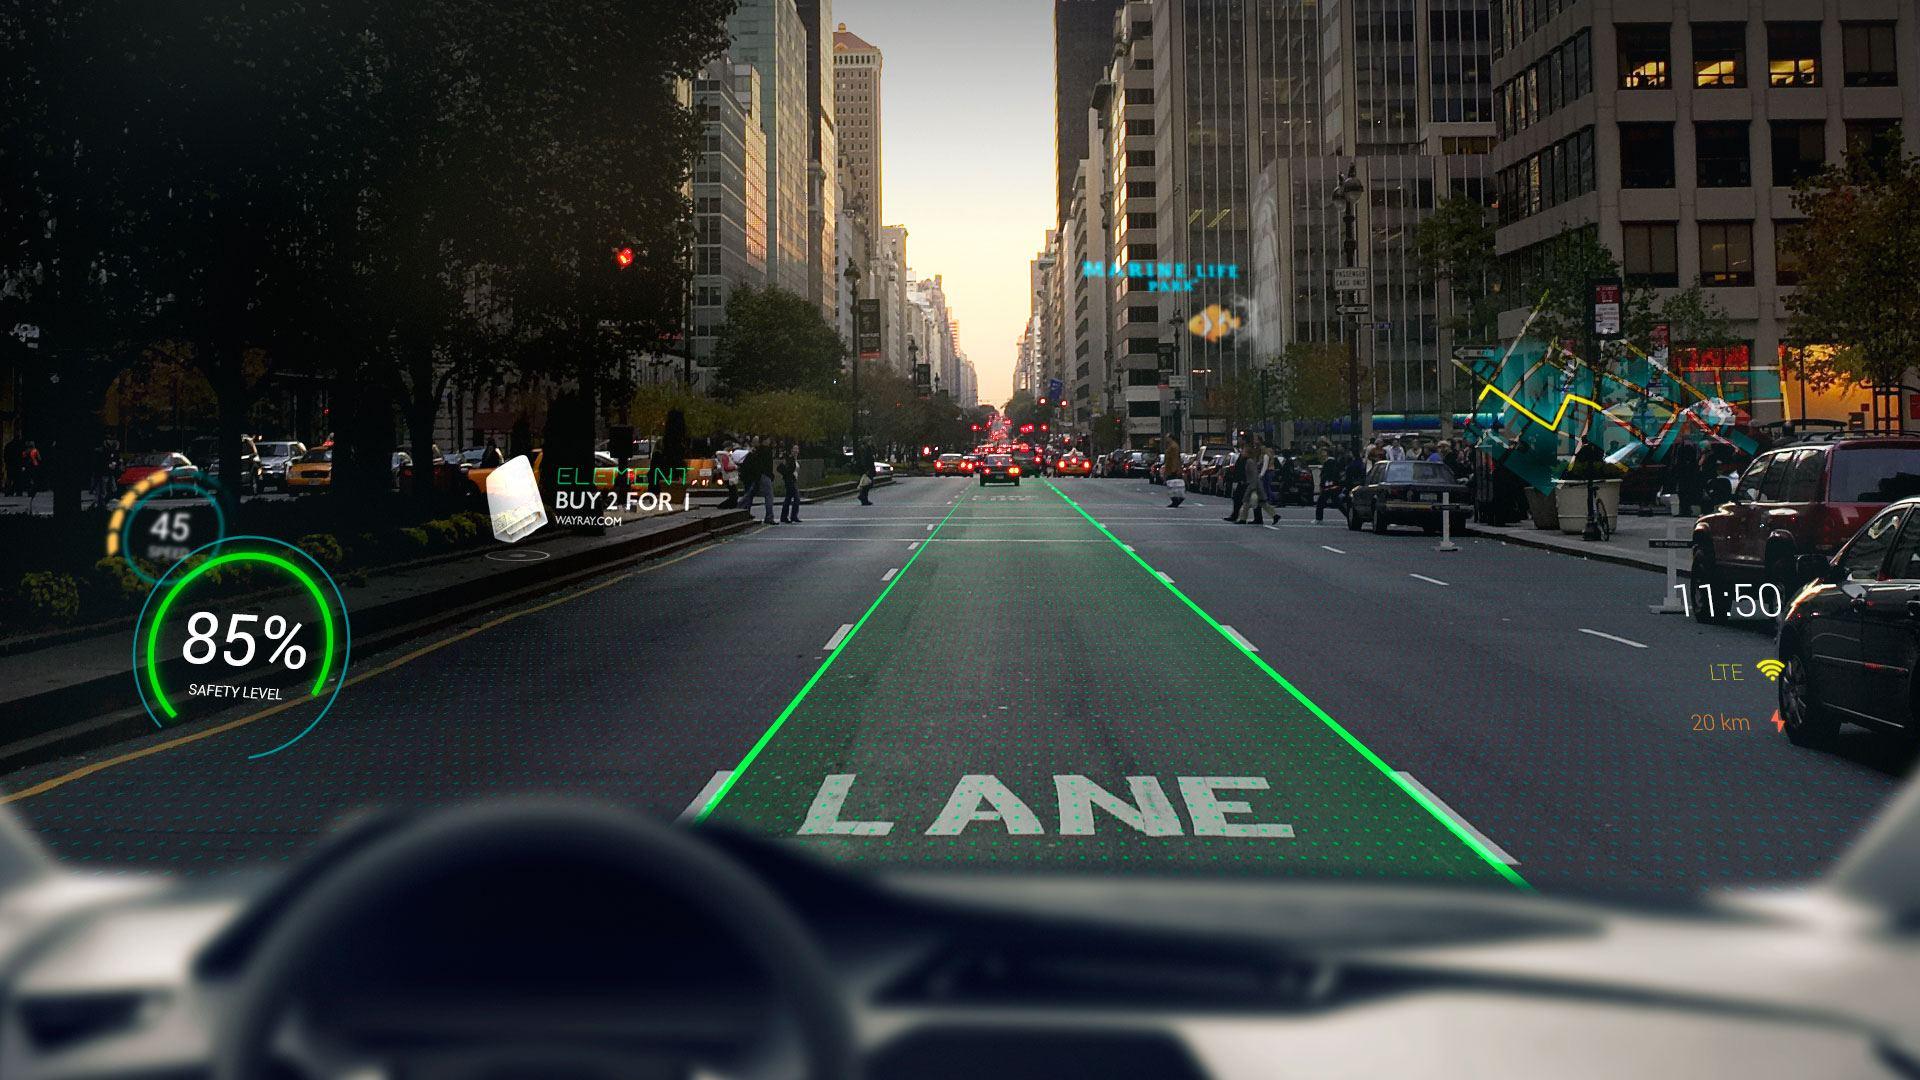 Alibaba eyes AR in cars